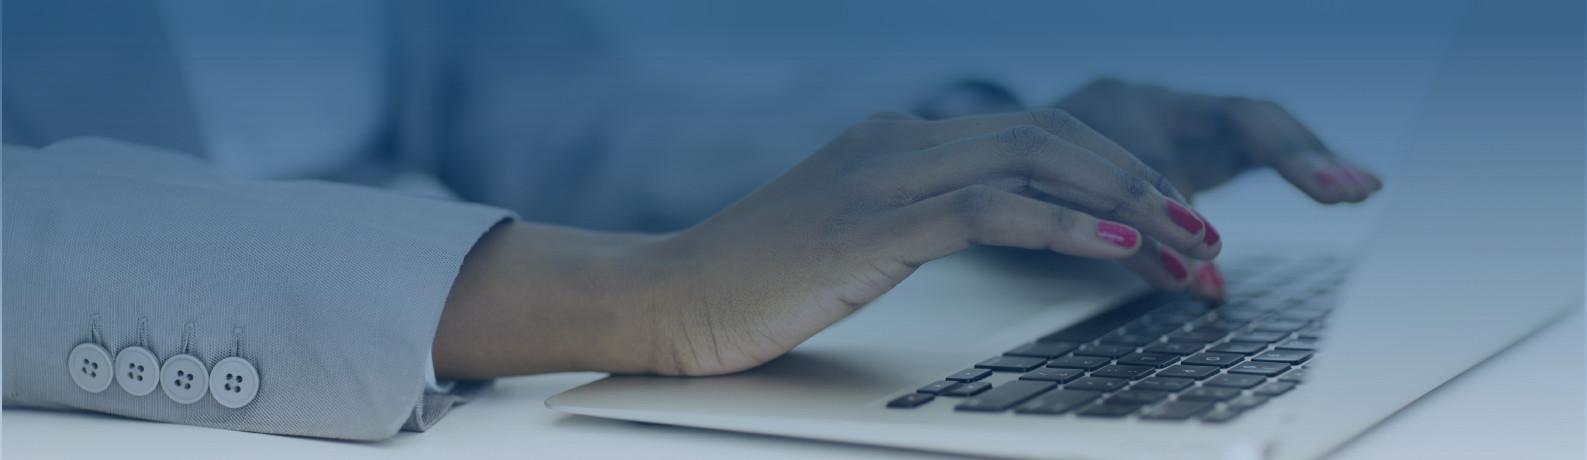 http://serpro.gov.br/menu/contato/cliente/perguntas-frequentes/ouvidoria/ouvidoria-perguntas-frequentes